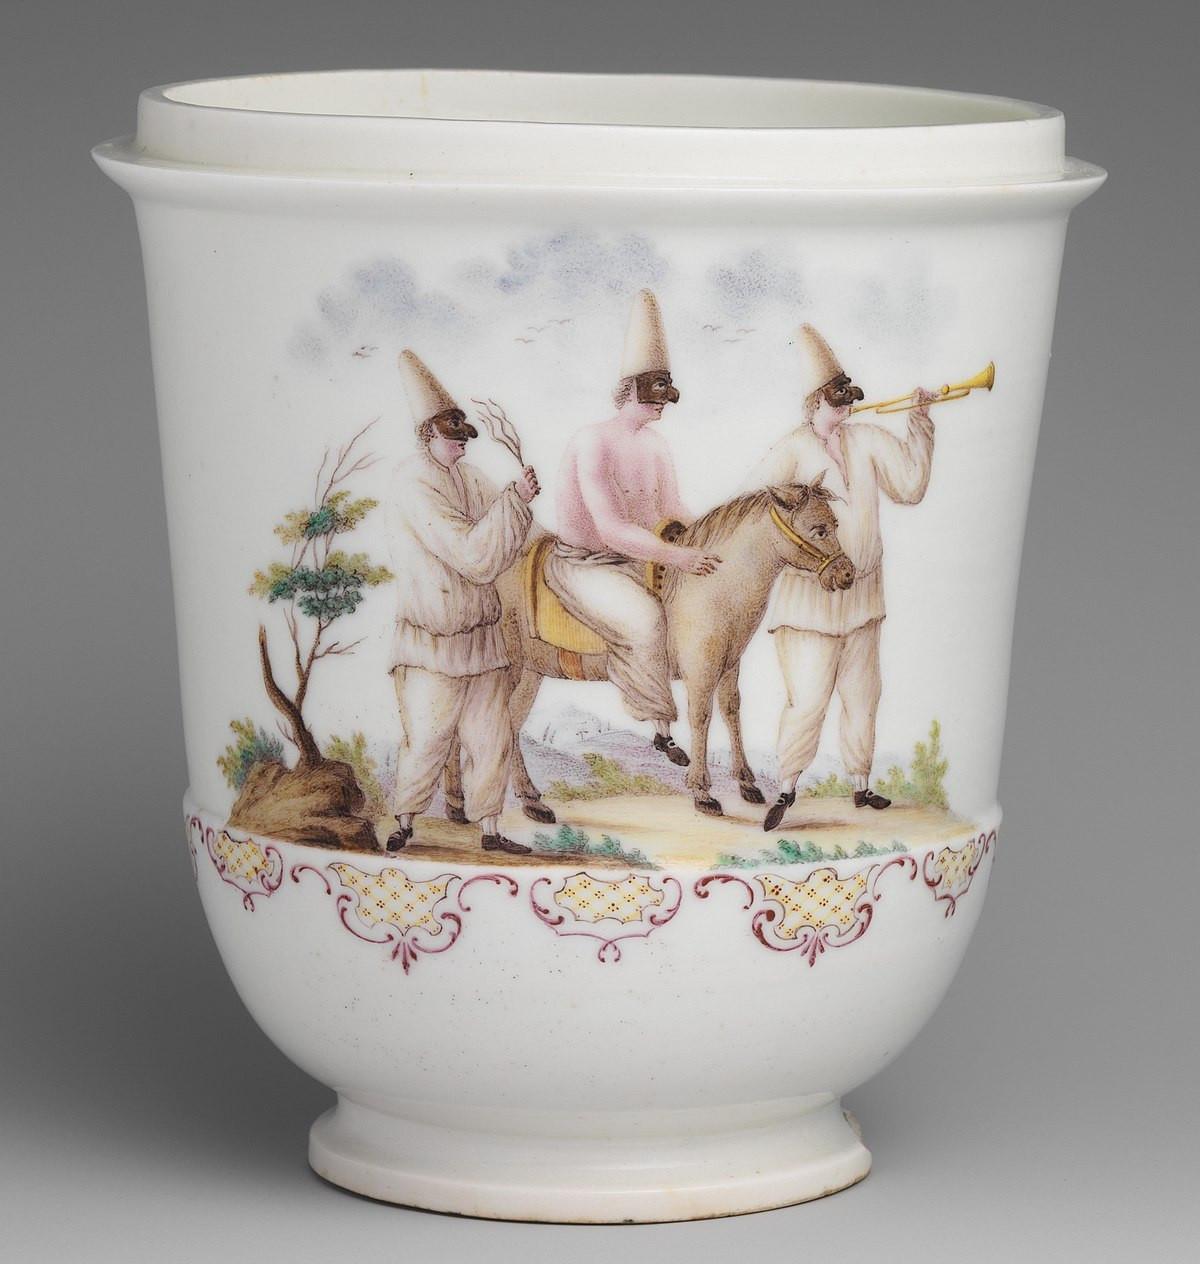 21 Fantastic orange Pottery Vase 2021 free download orange pottery vase of capodimonte porcelain wikipedia inside 1200px jar met dp168331 cropped